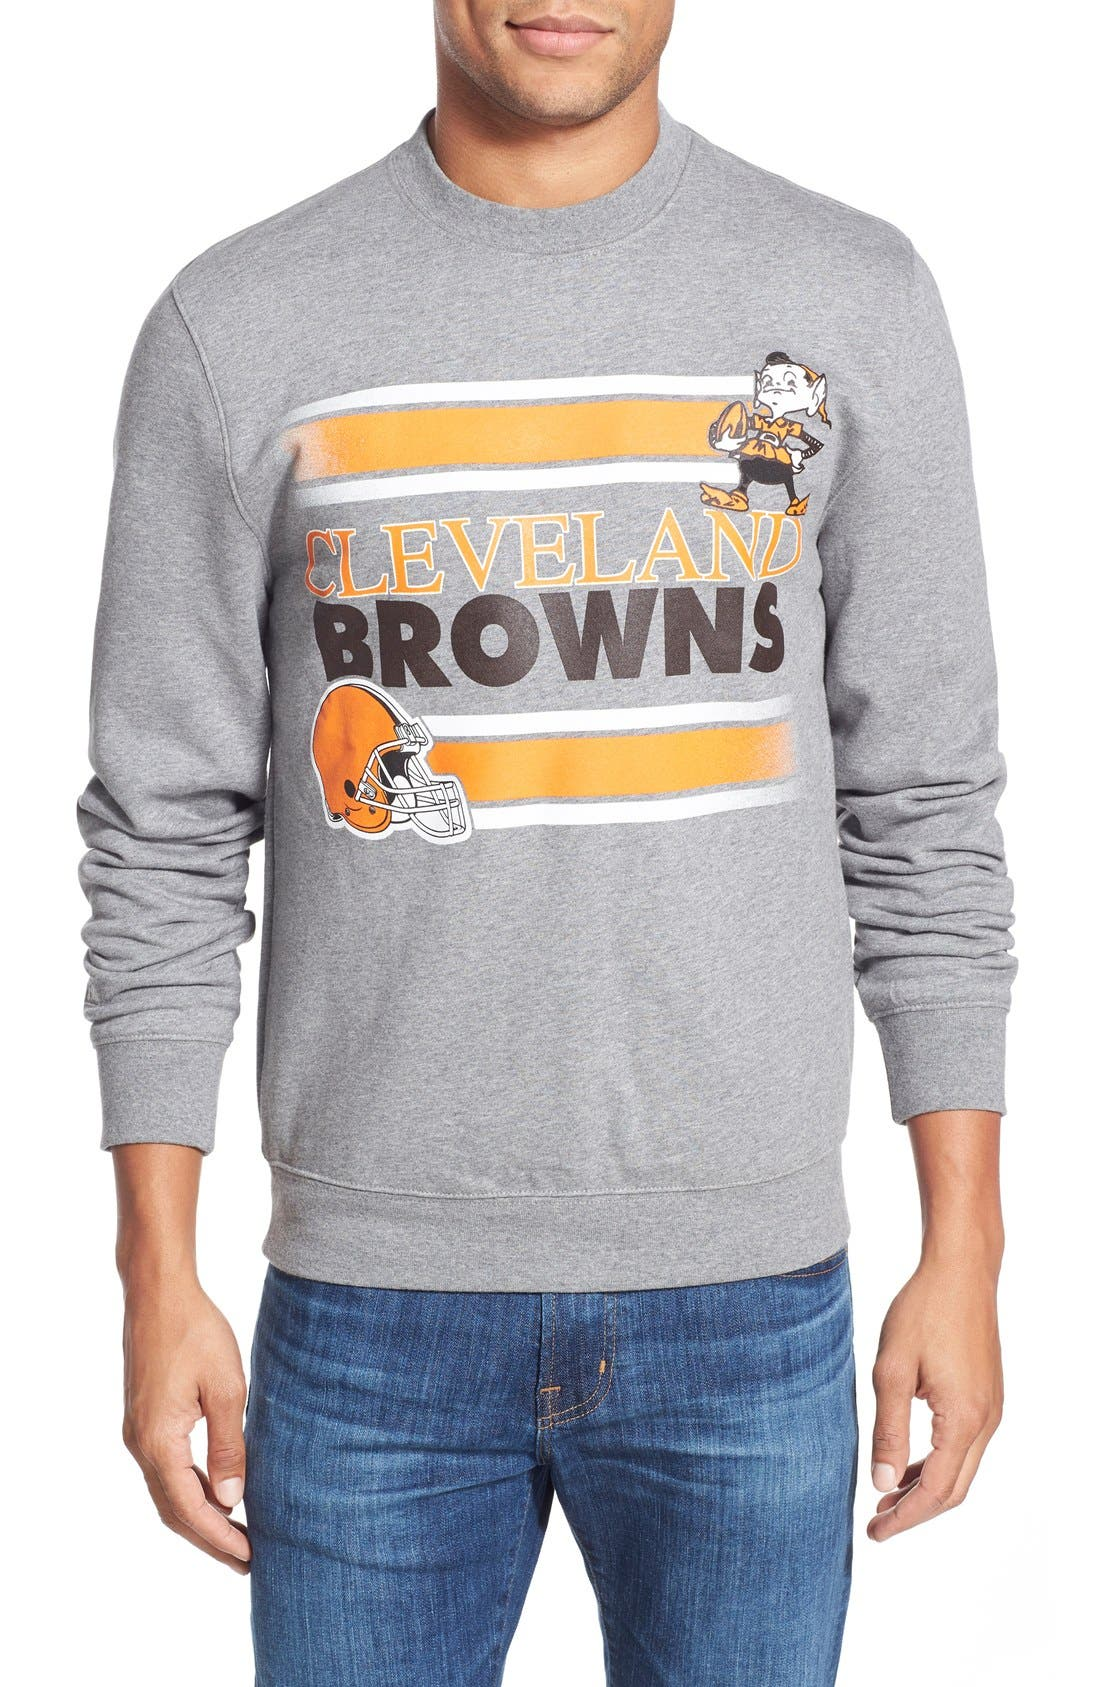 MITCHELL & NESS Mitchell &Ness'Cleveland Browns' Tailored Fleece Crewneck Sweatshirt, Main, color, 061